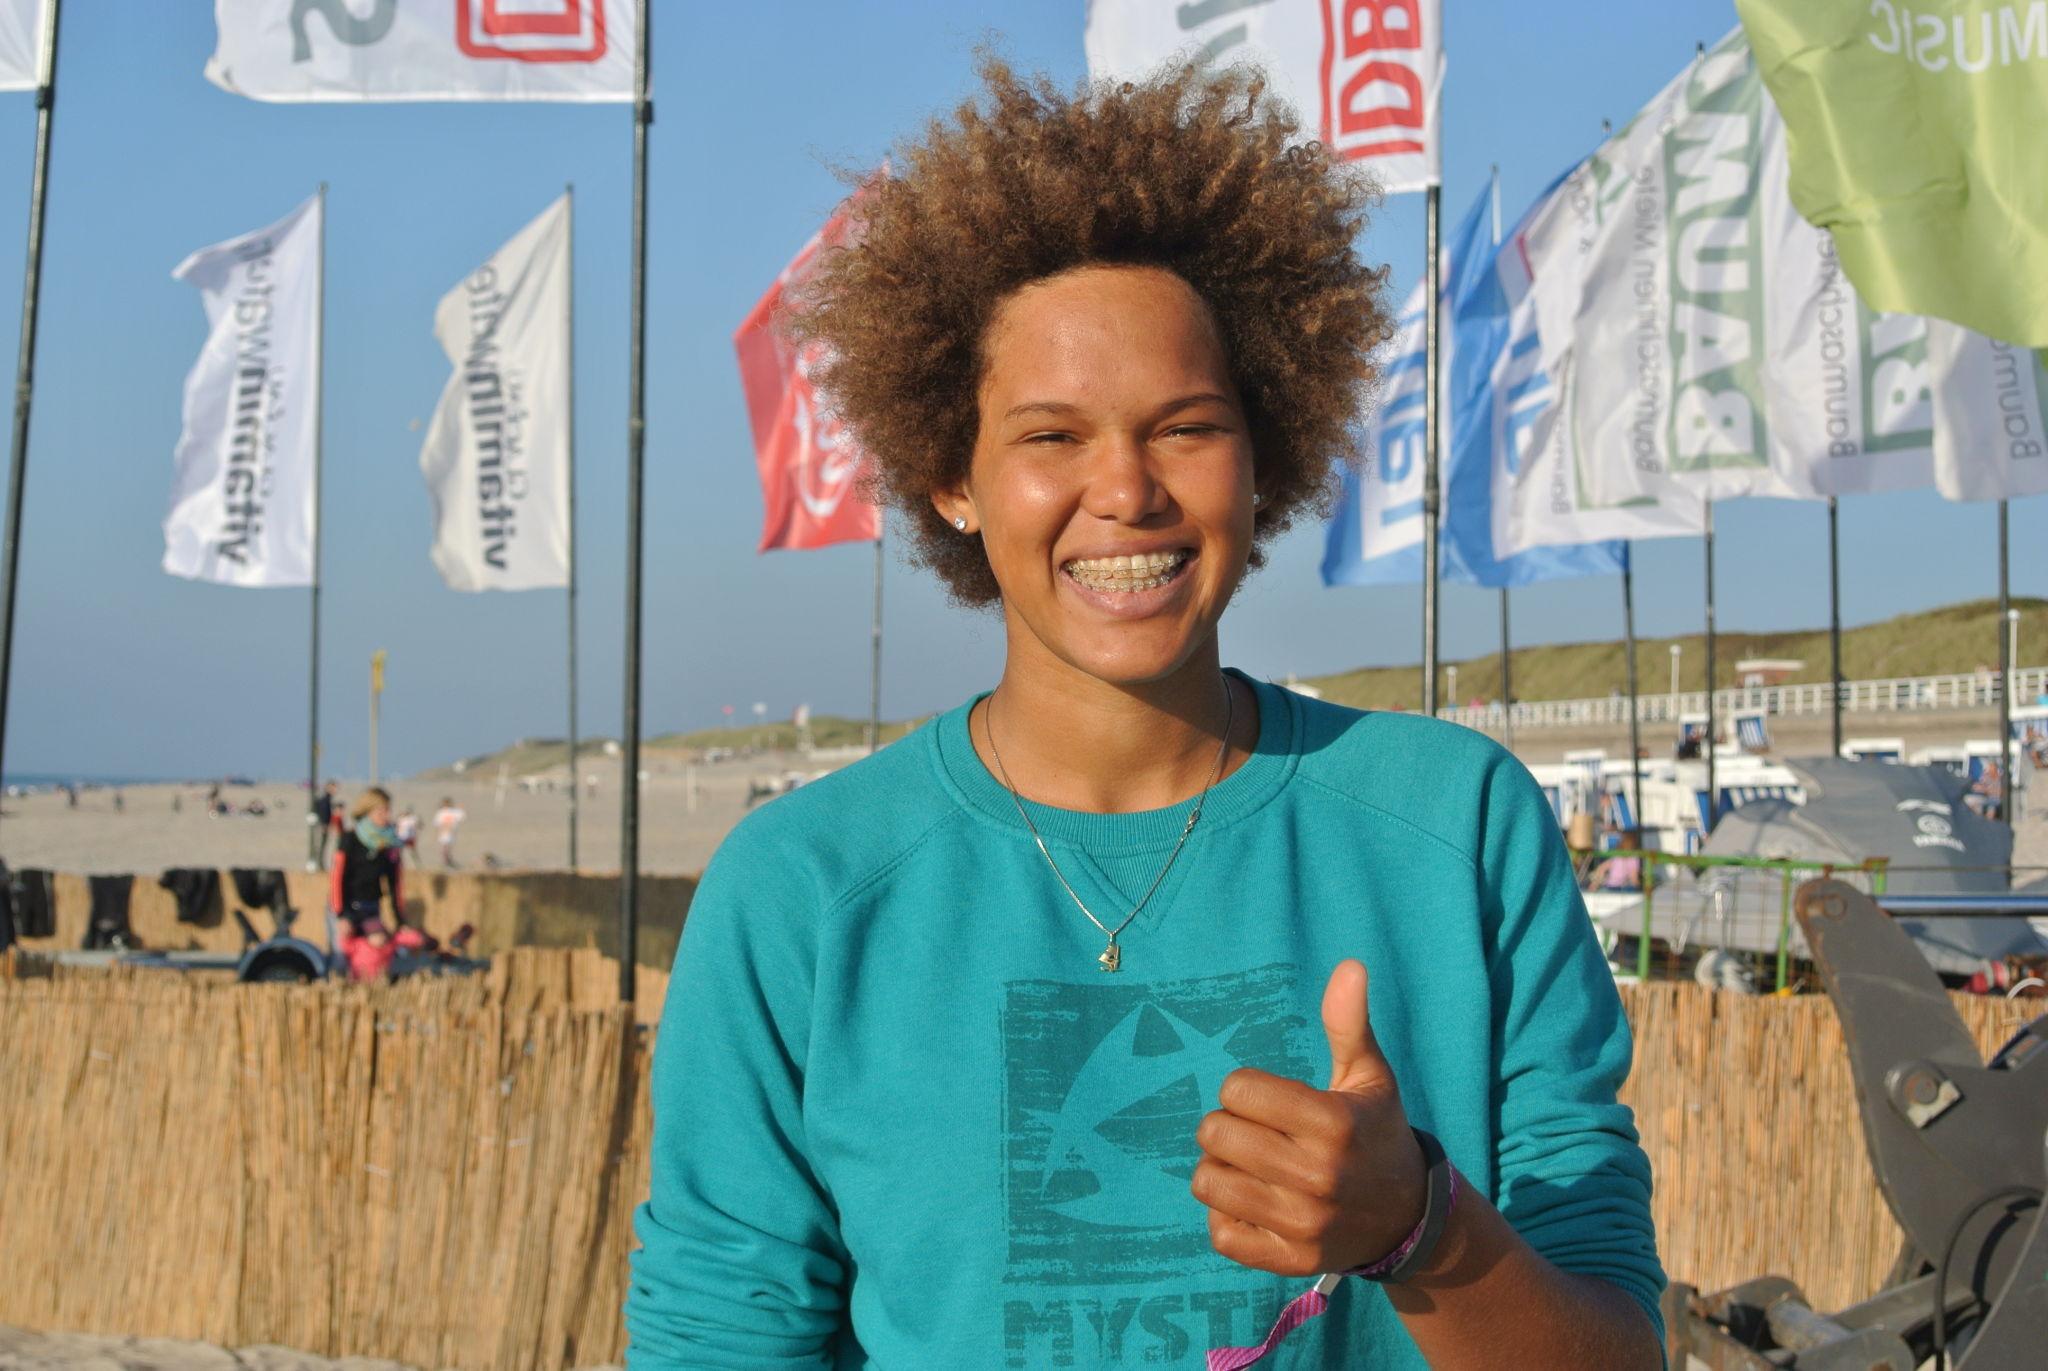 Fakten über Windsurfer – #Windsurfworldcup Sylt